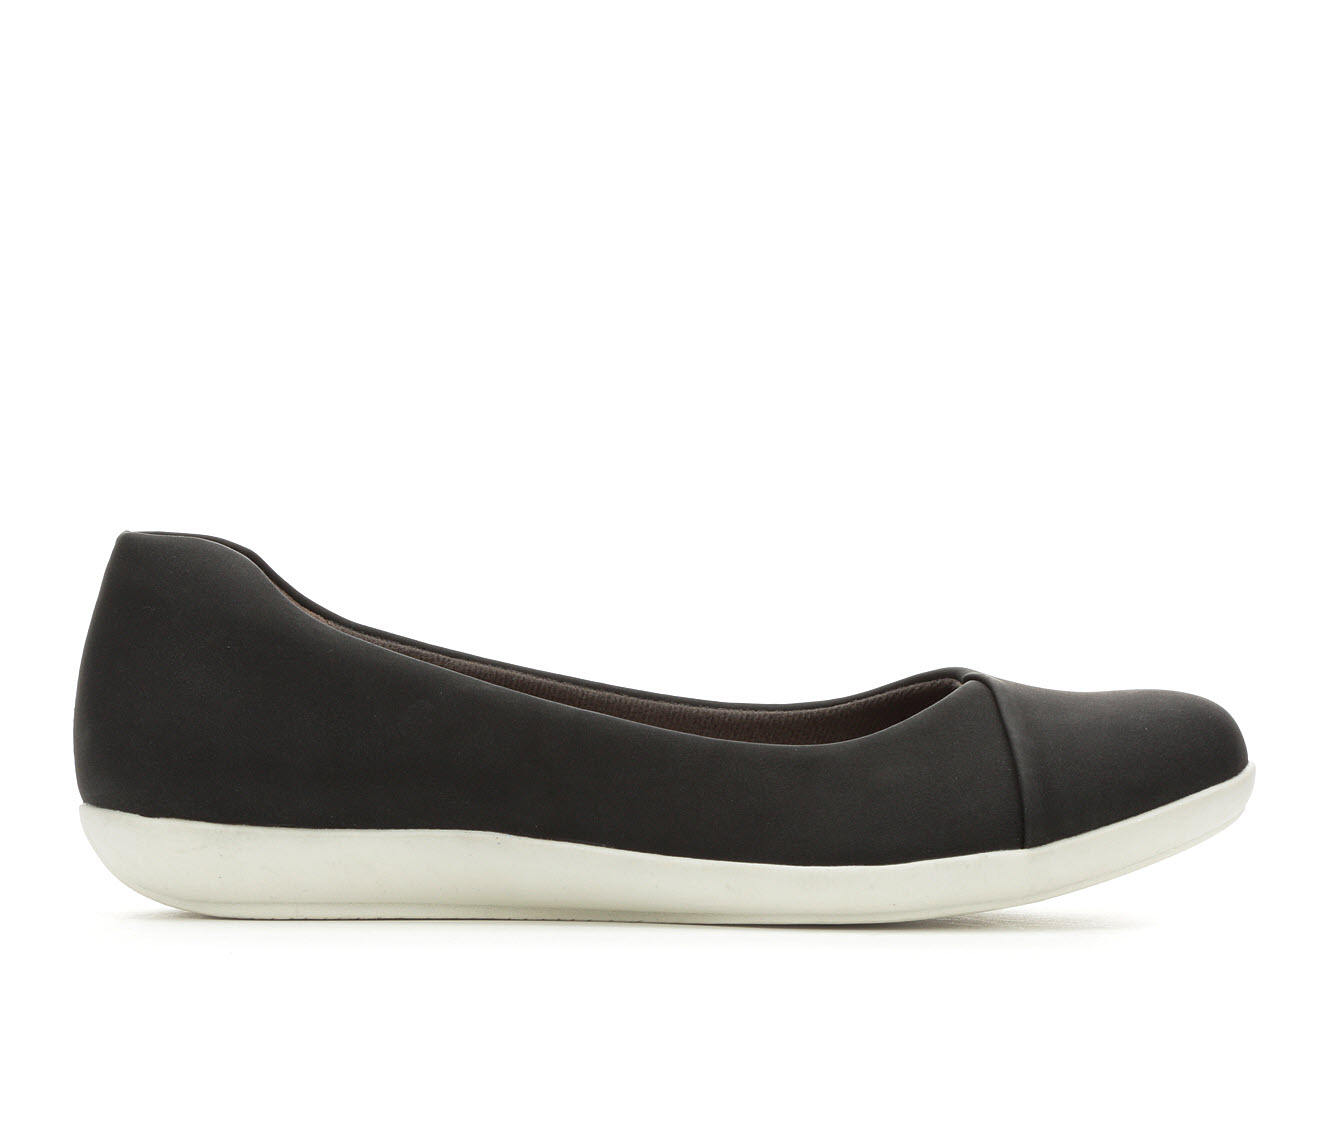 EuroSoft Manila Women's Shoe (Black Faux Leather)